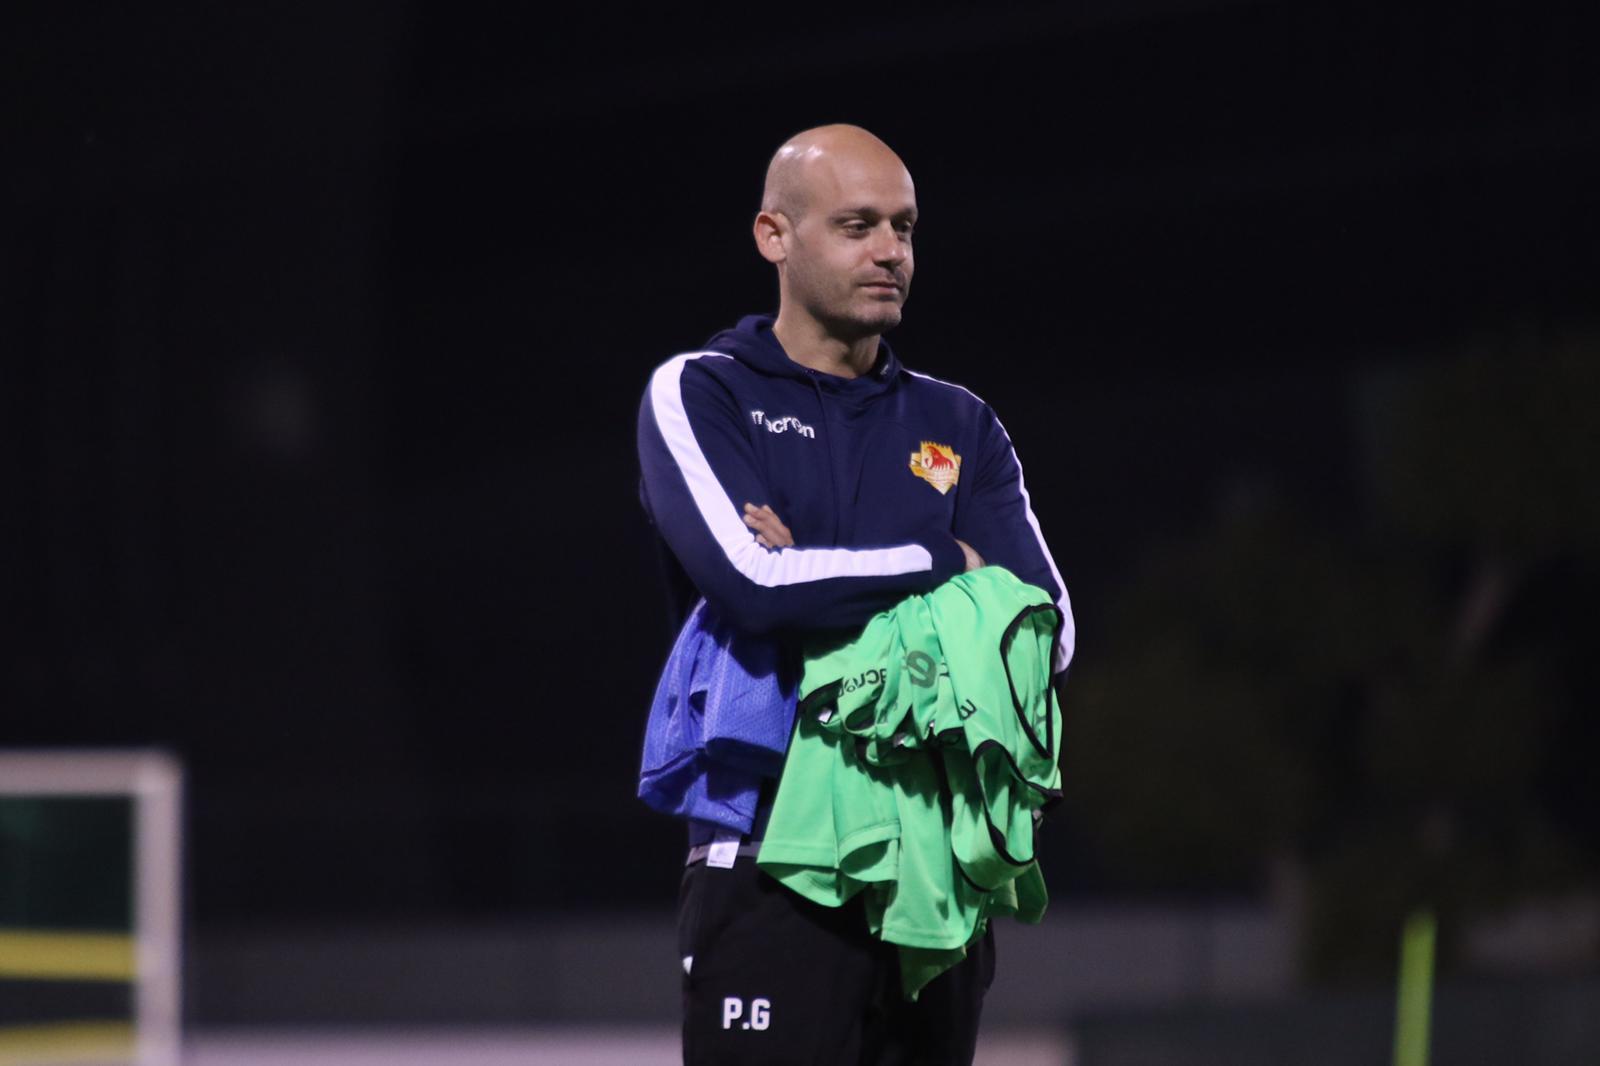 AS reports on Pedro Gómez Carmona, the Spaniard who has revolutionised Bahraini football